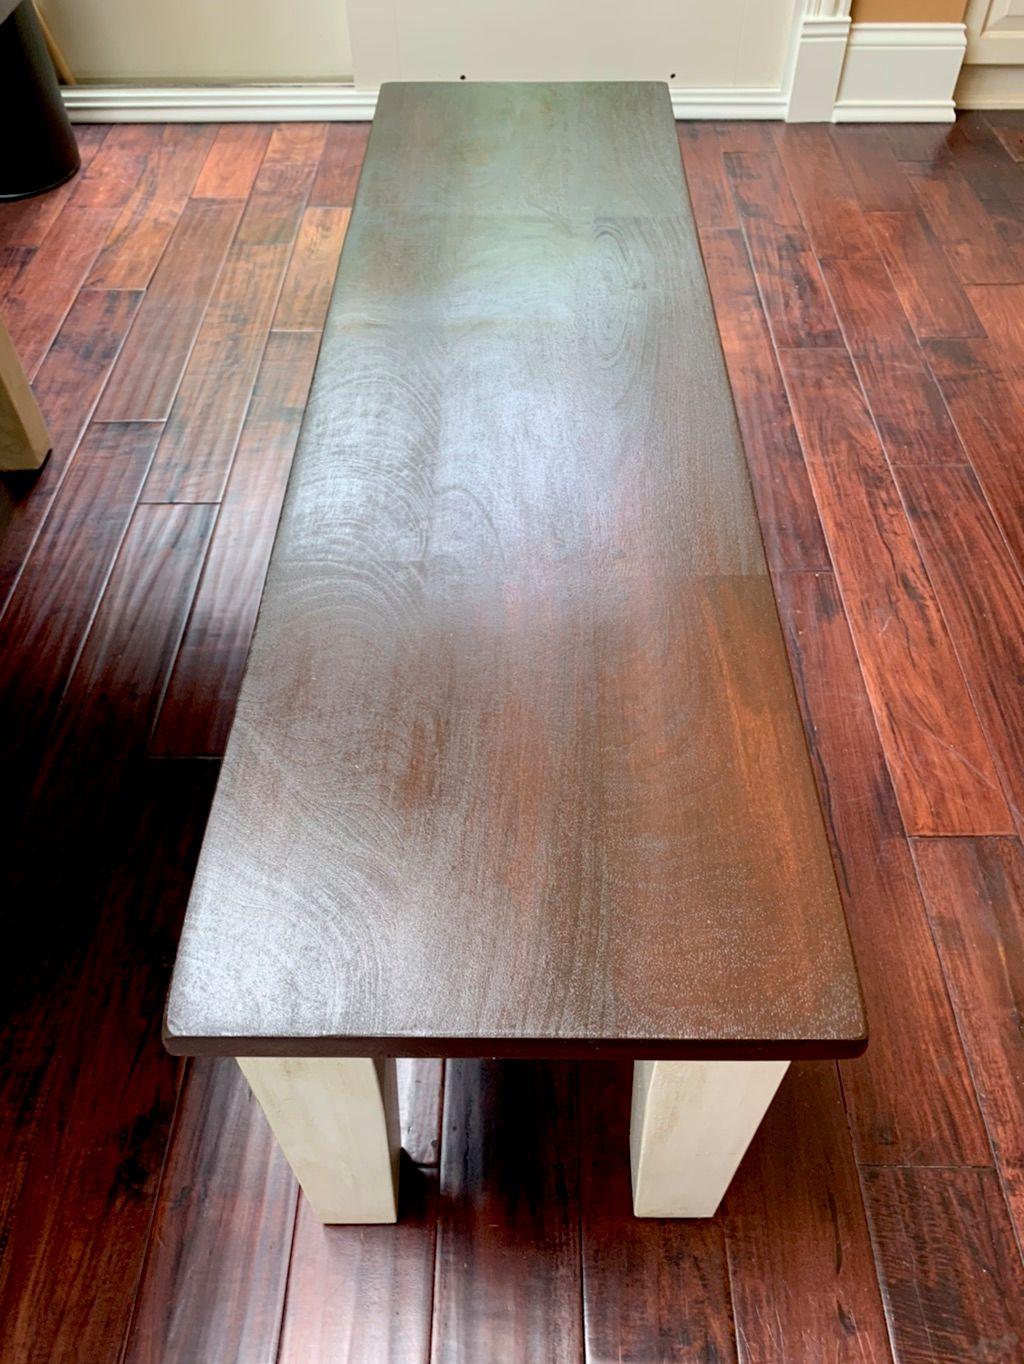 Furniture Refinishing - Hinsdale 2020